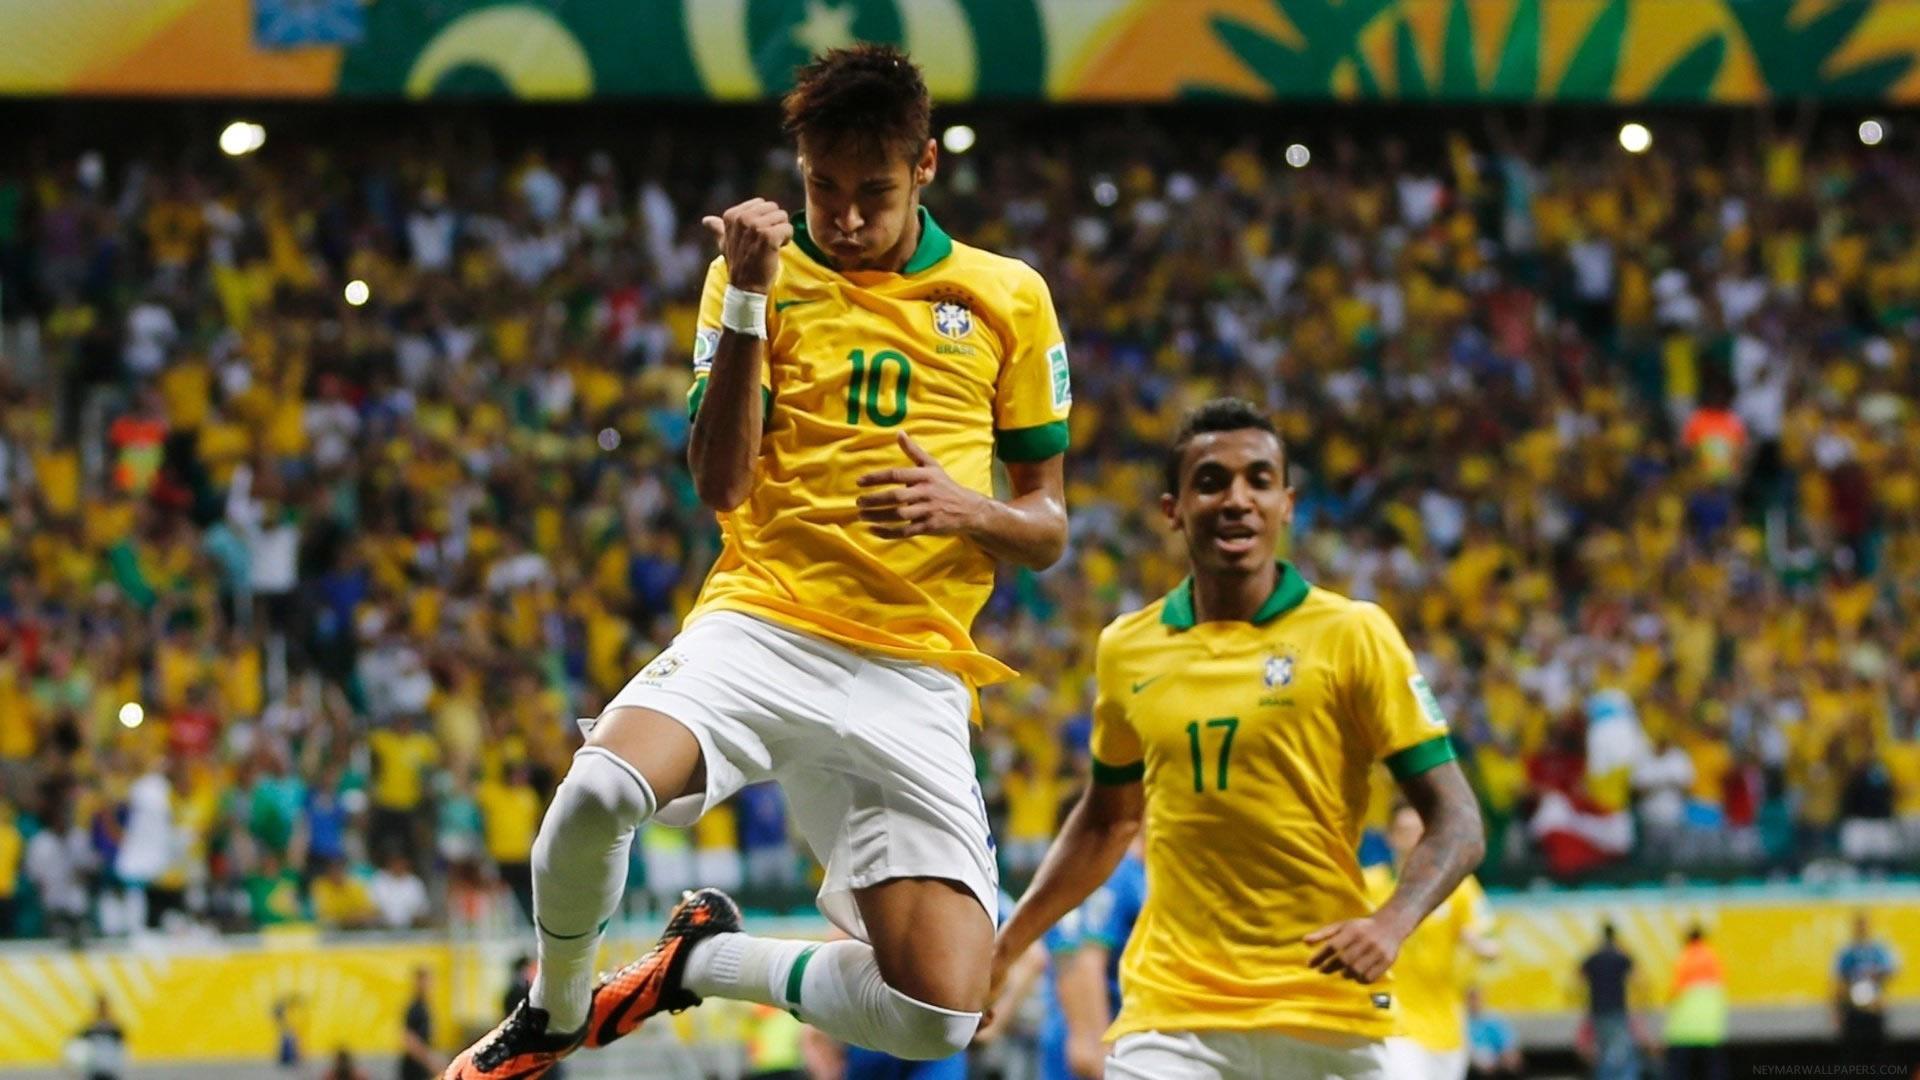 Neymar in air wallpaper